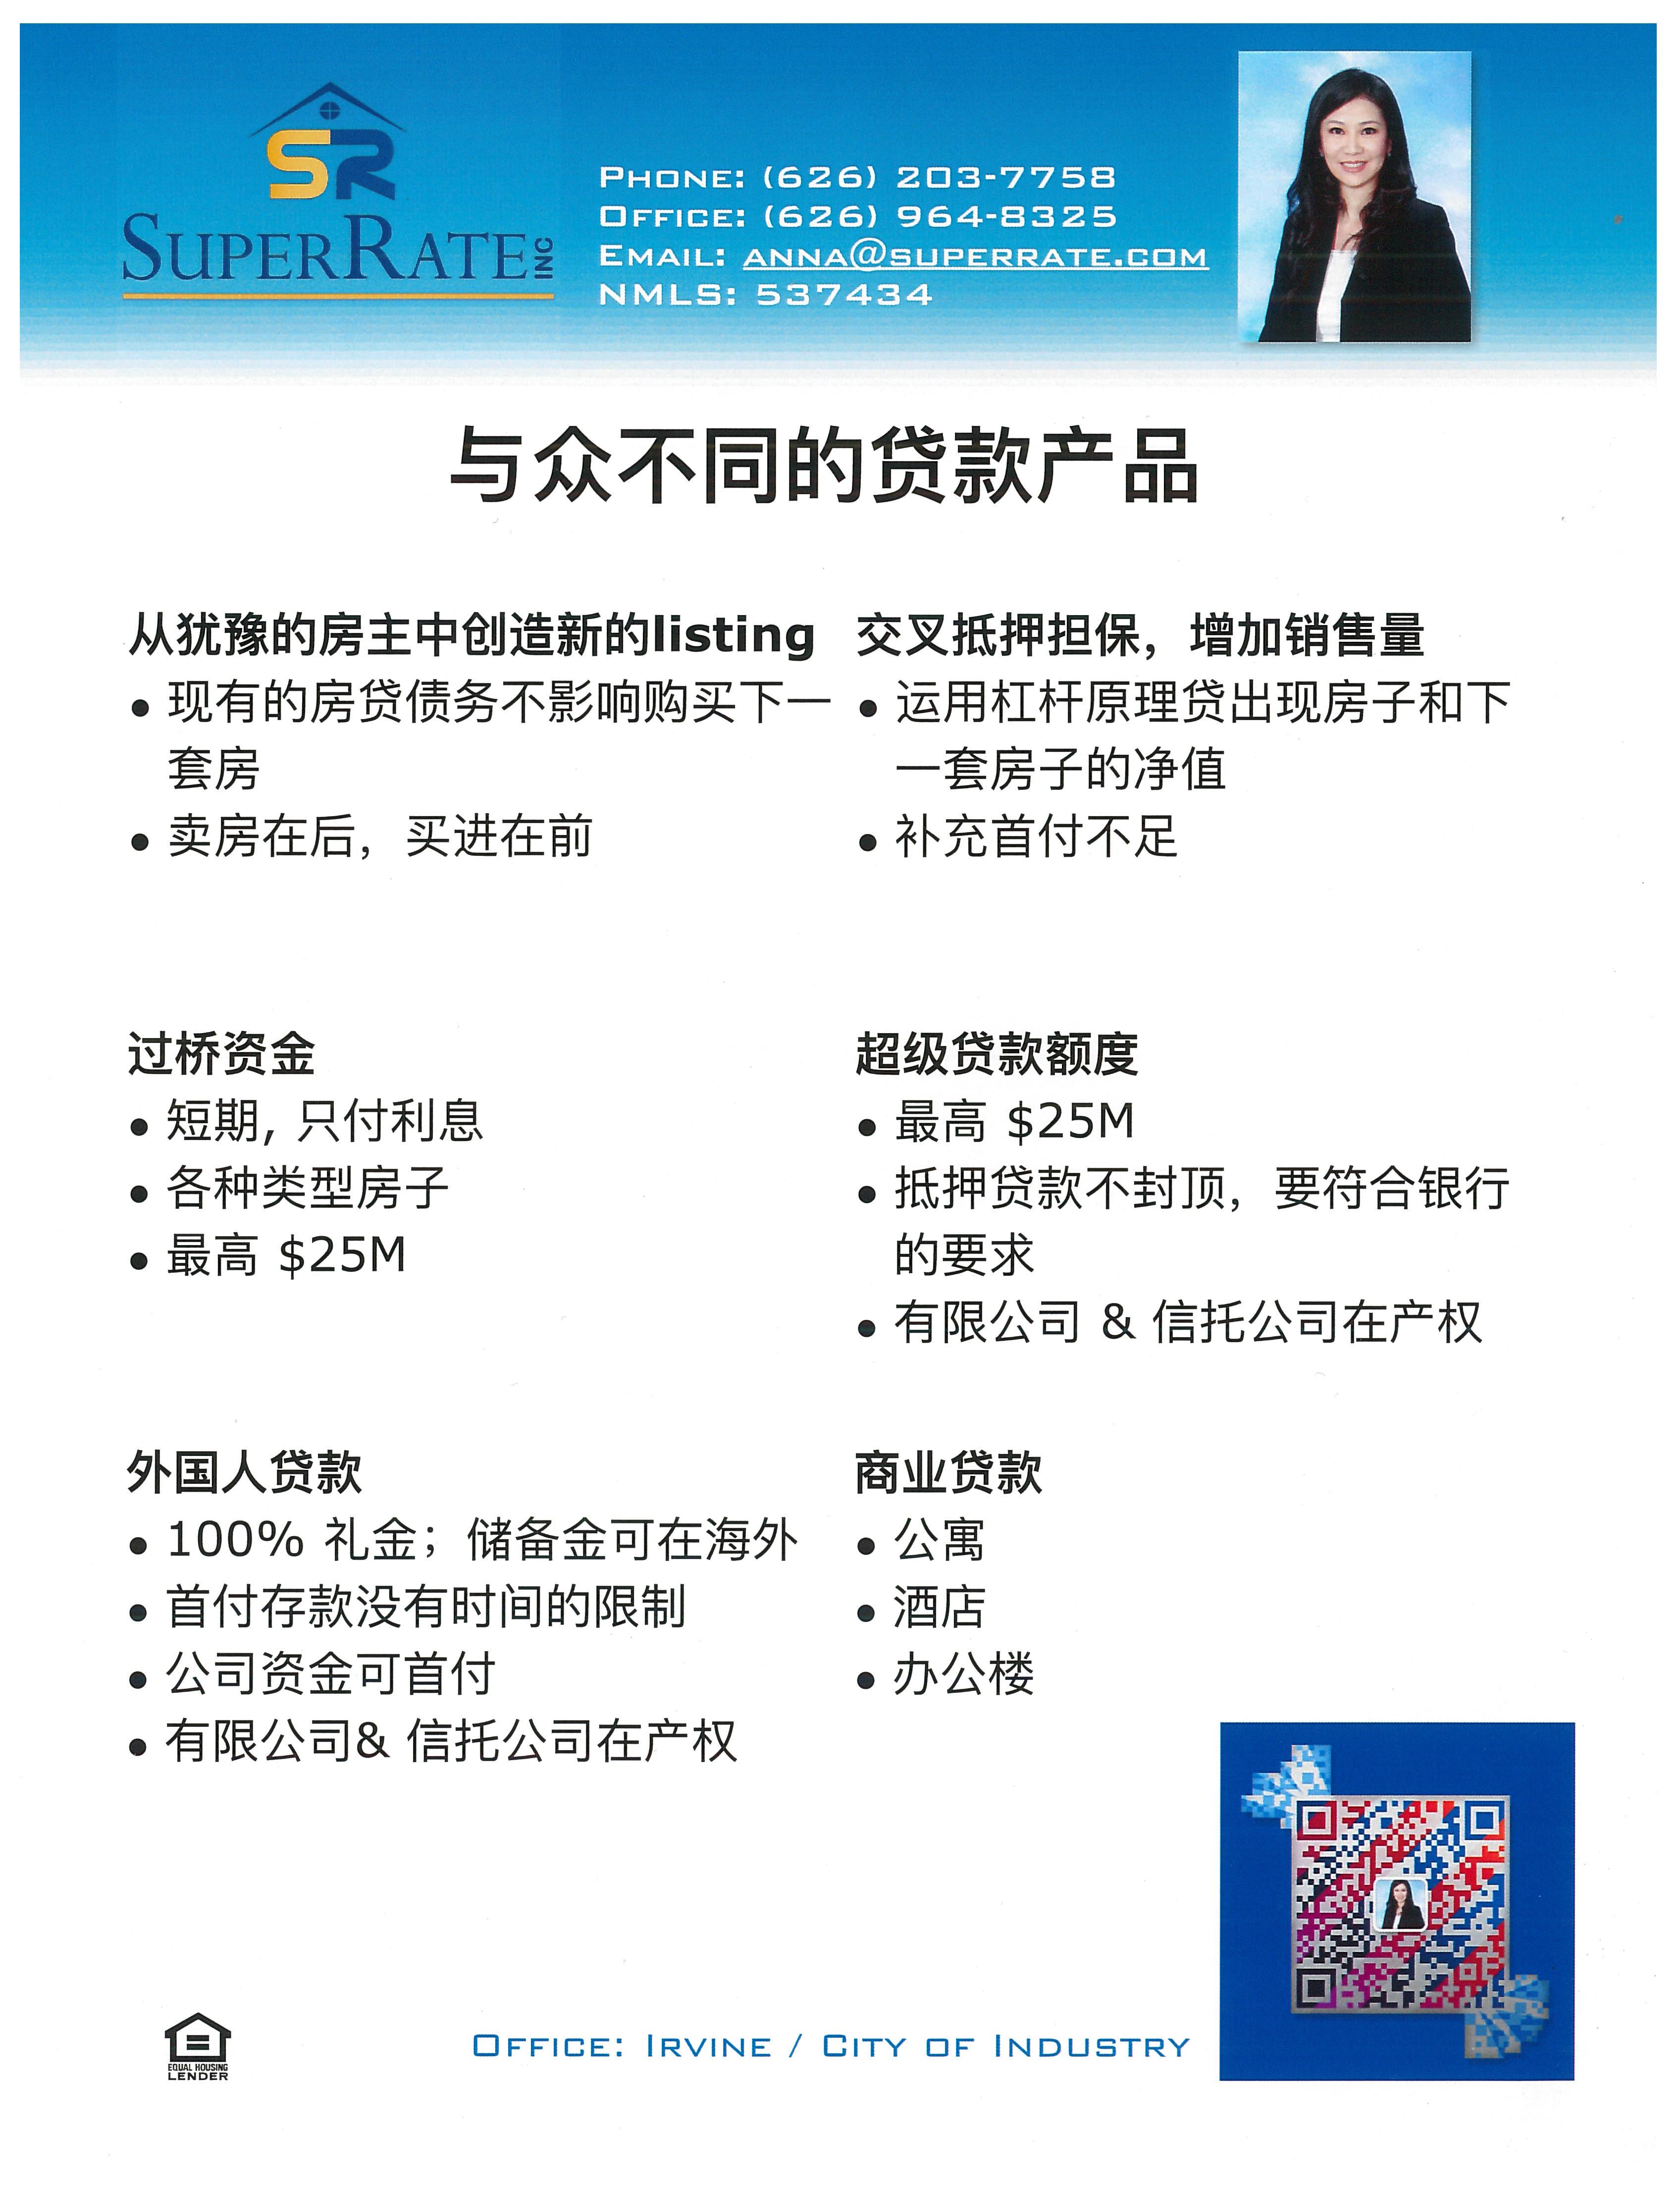 Orange County Chinese Mandarin mortgage bank home loan lender